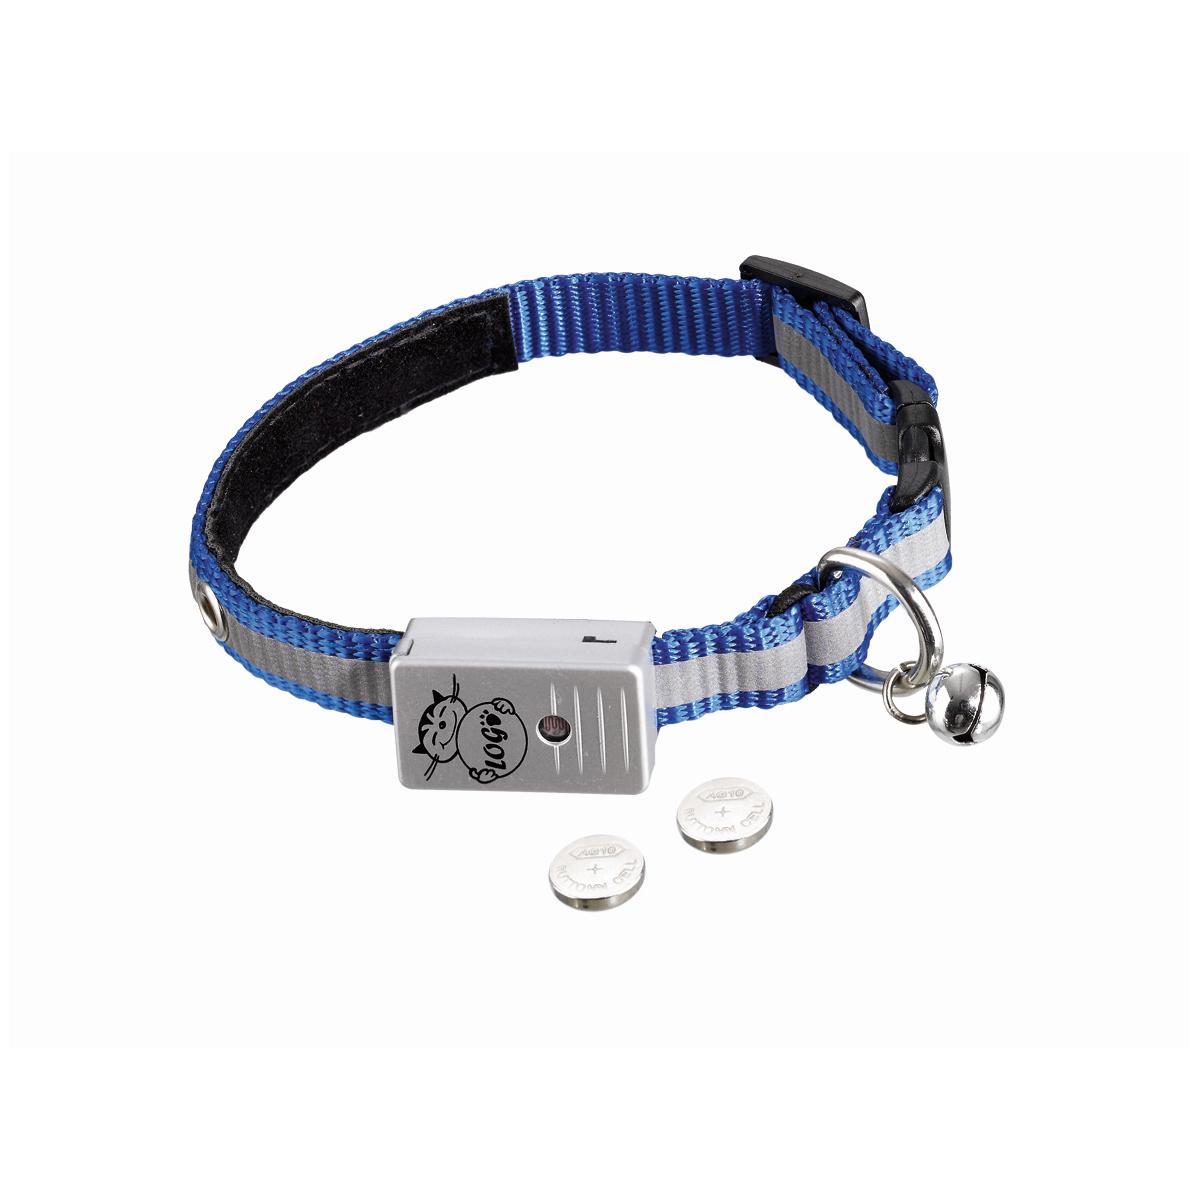 Halsband starlight led blauw